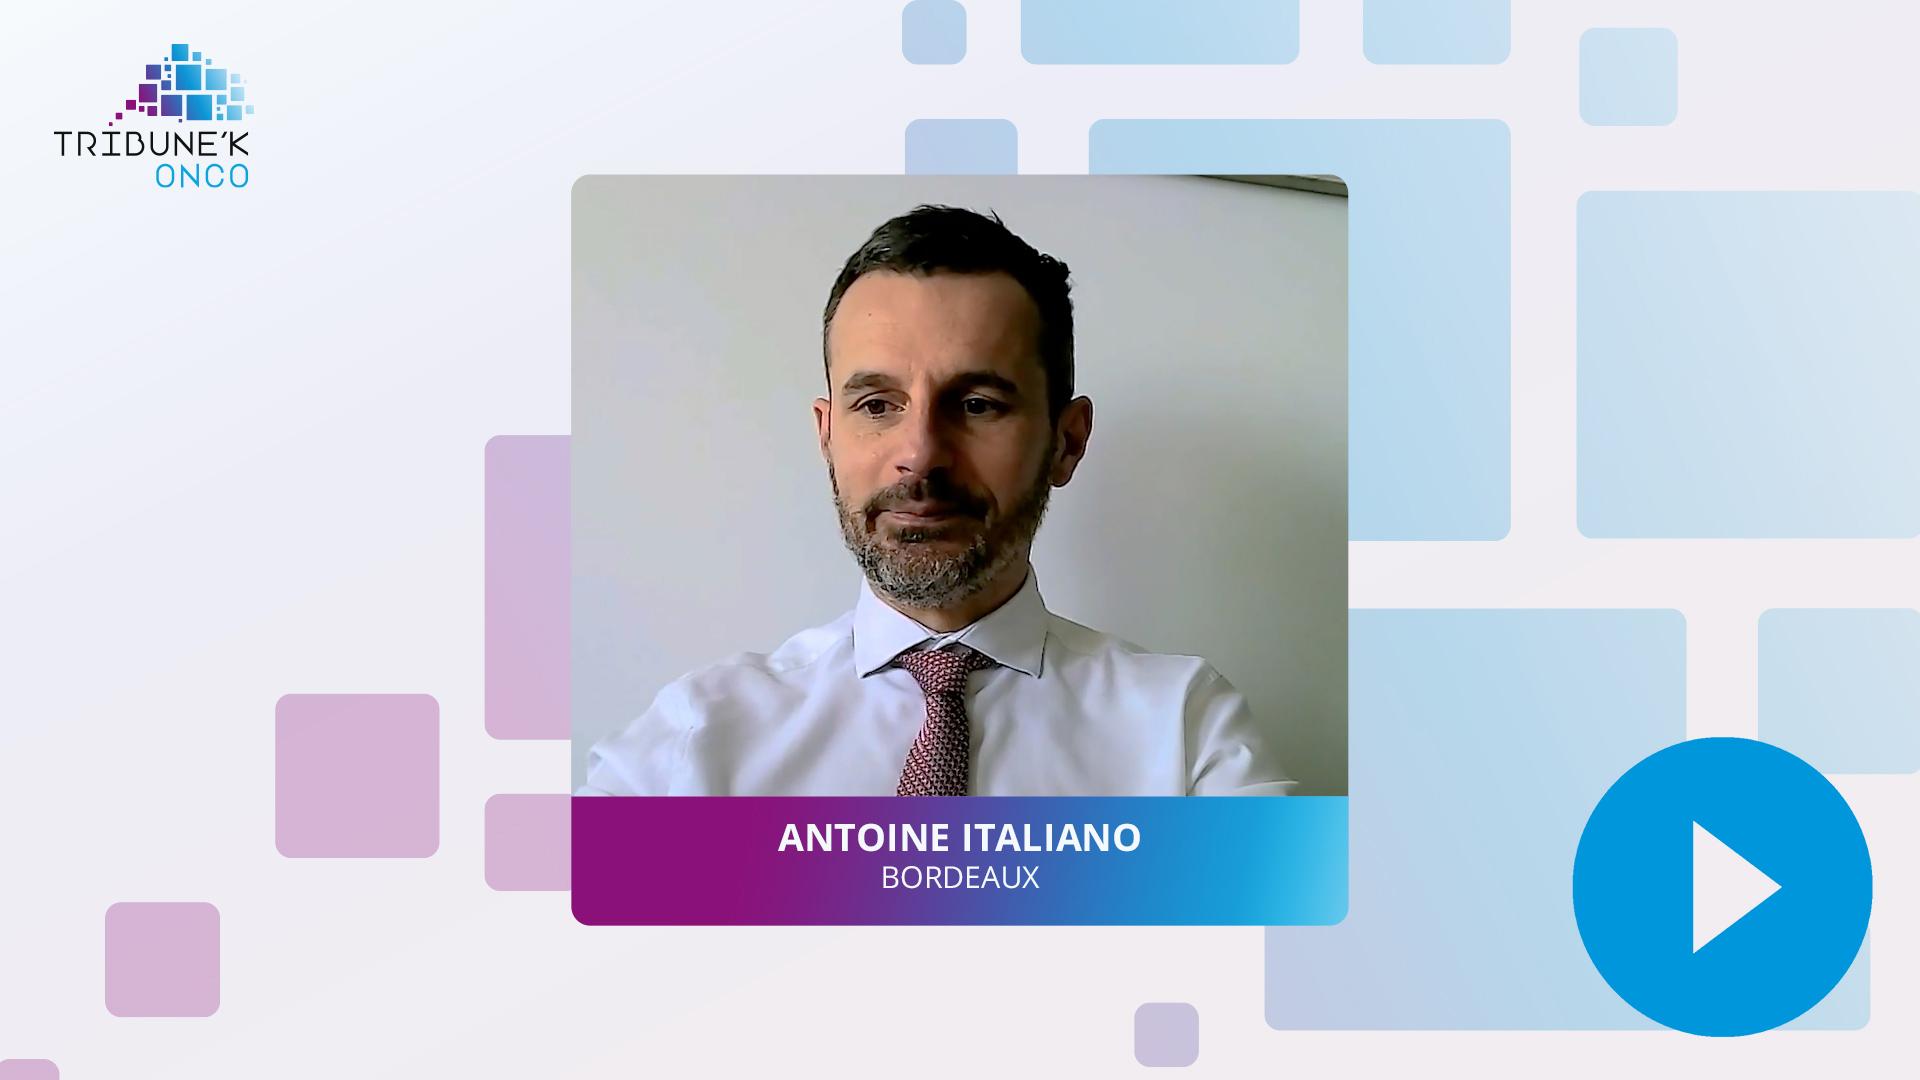 TKO_2021_AACR_04_ANTOINE_ITALIANO_play